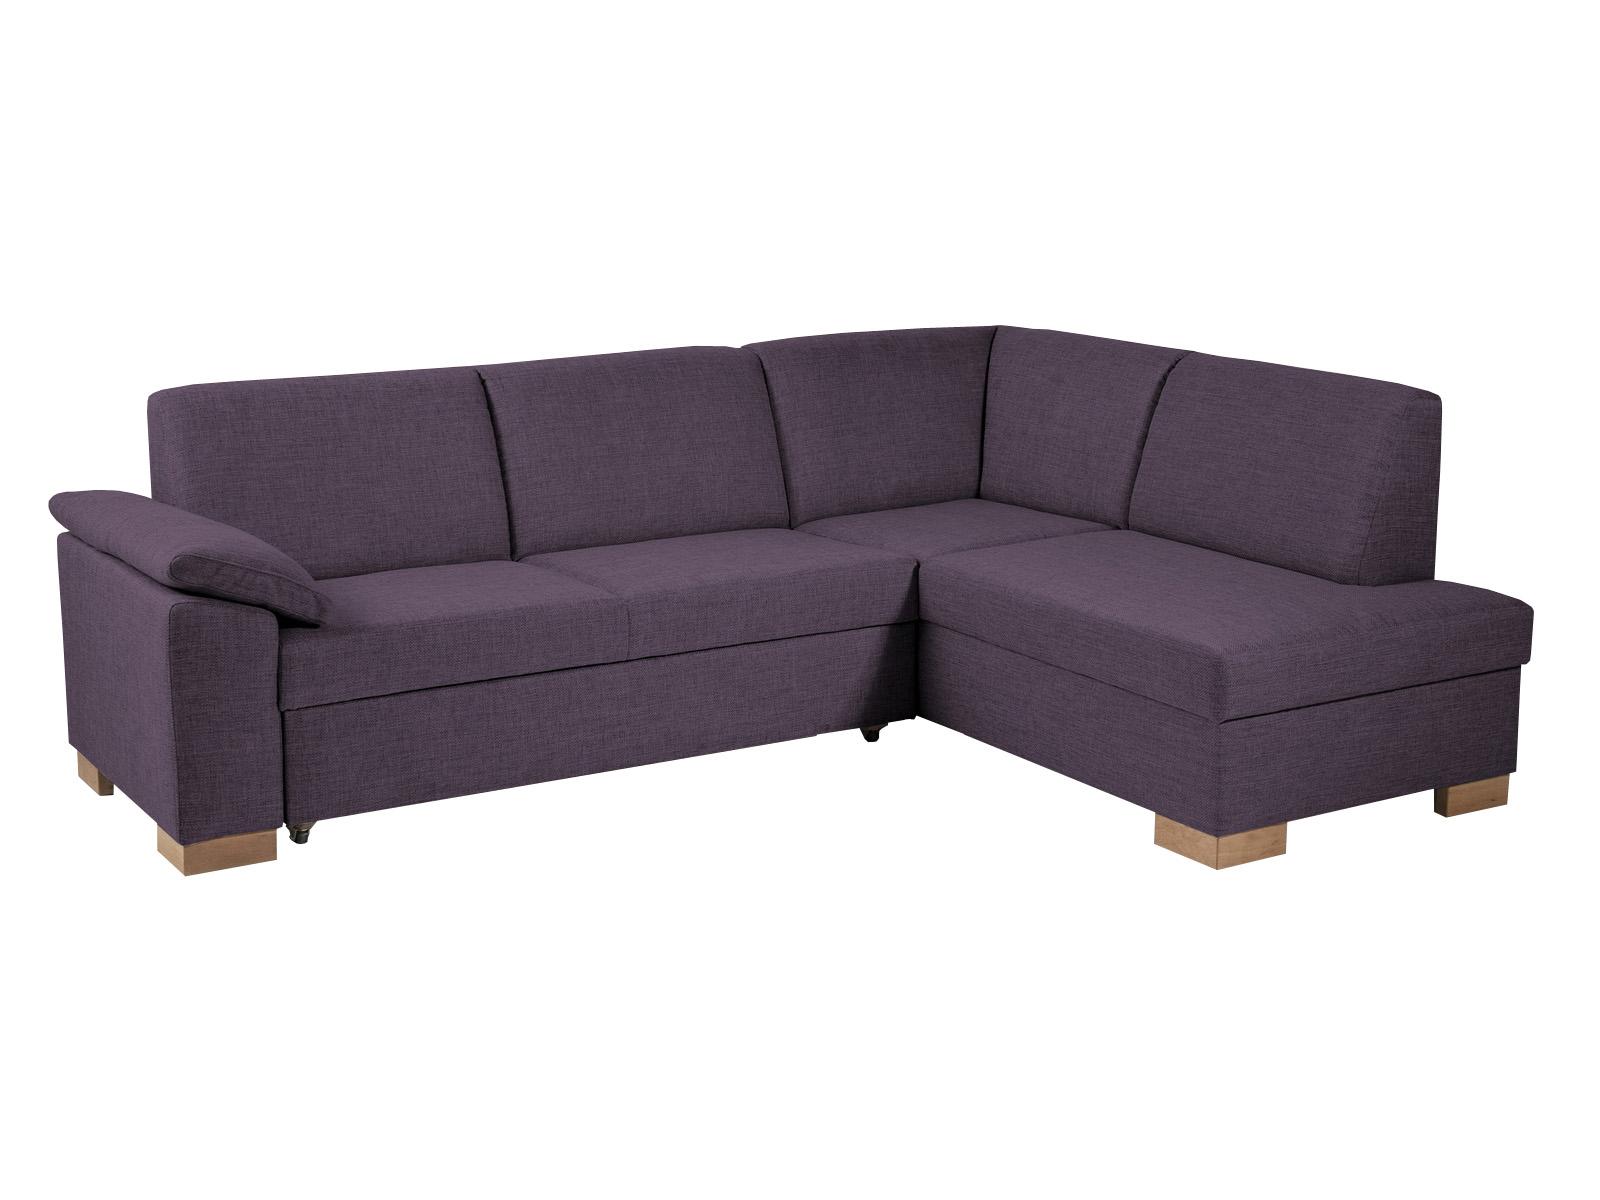 Rohová sedačka - BRW - Malaga Lux 2,5F+OT fialová (P)